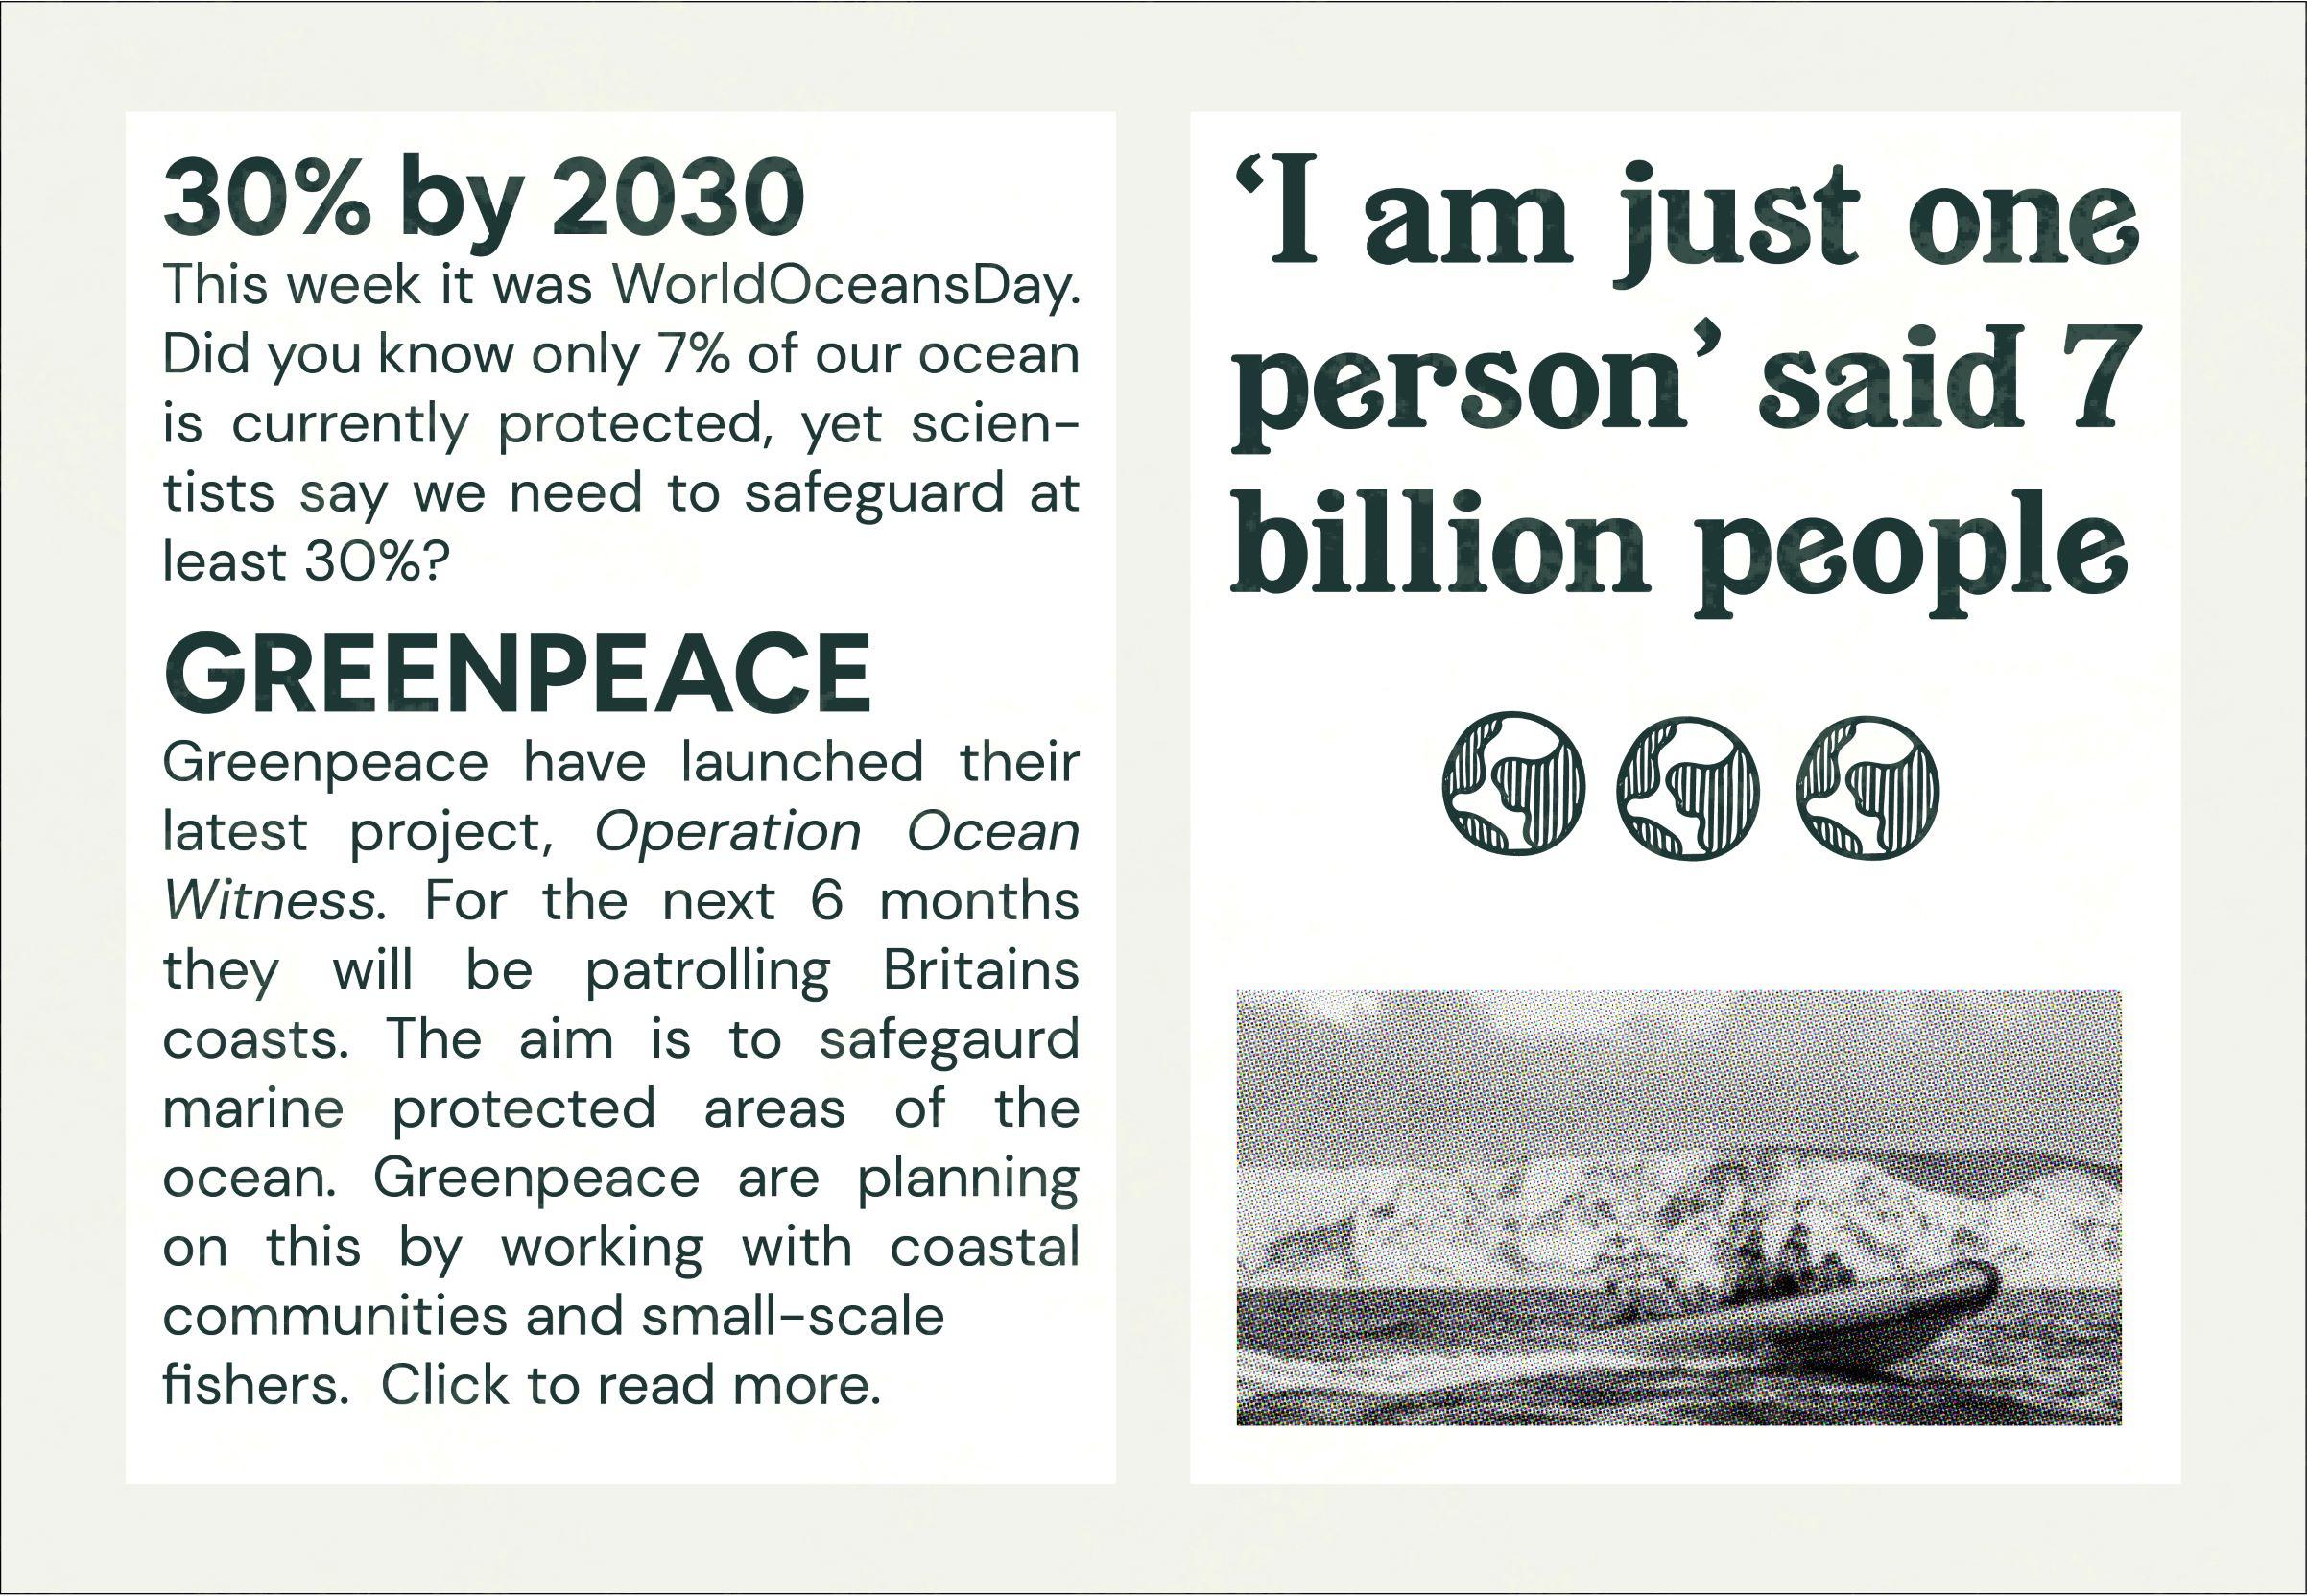 30% by 2030